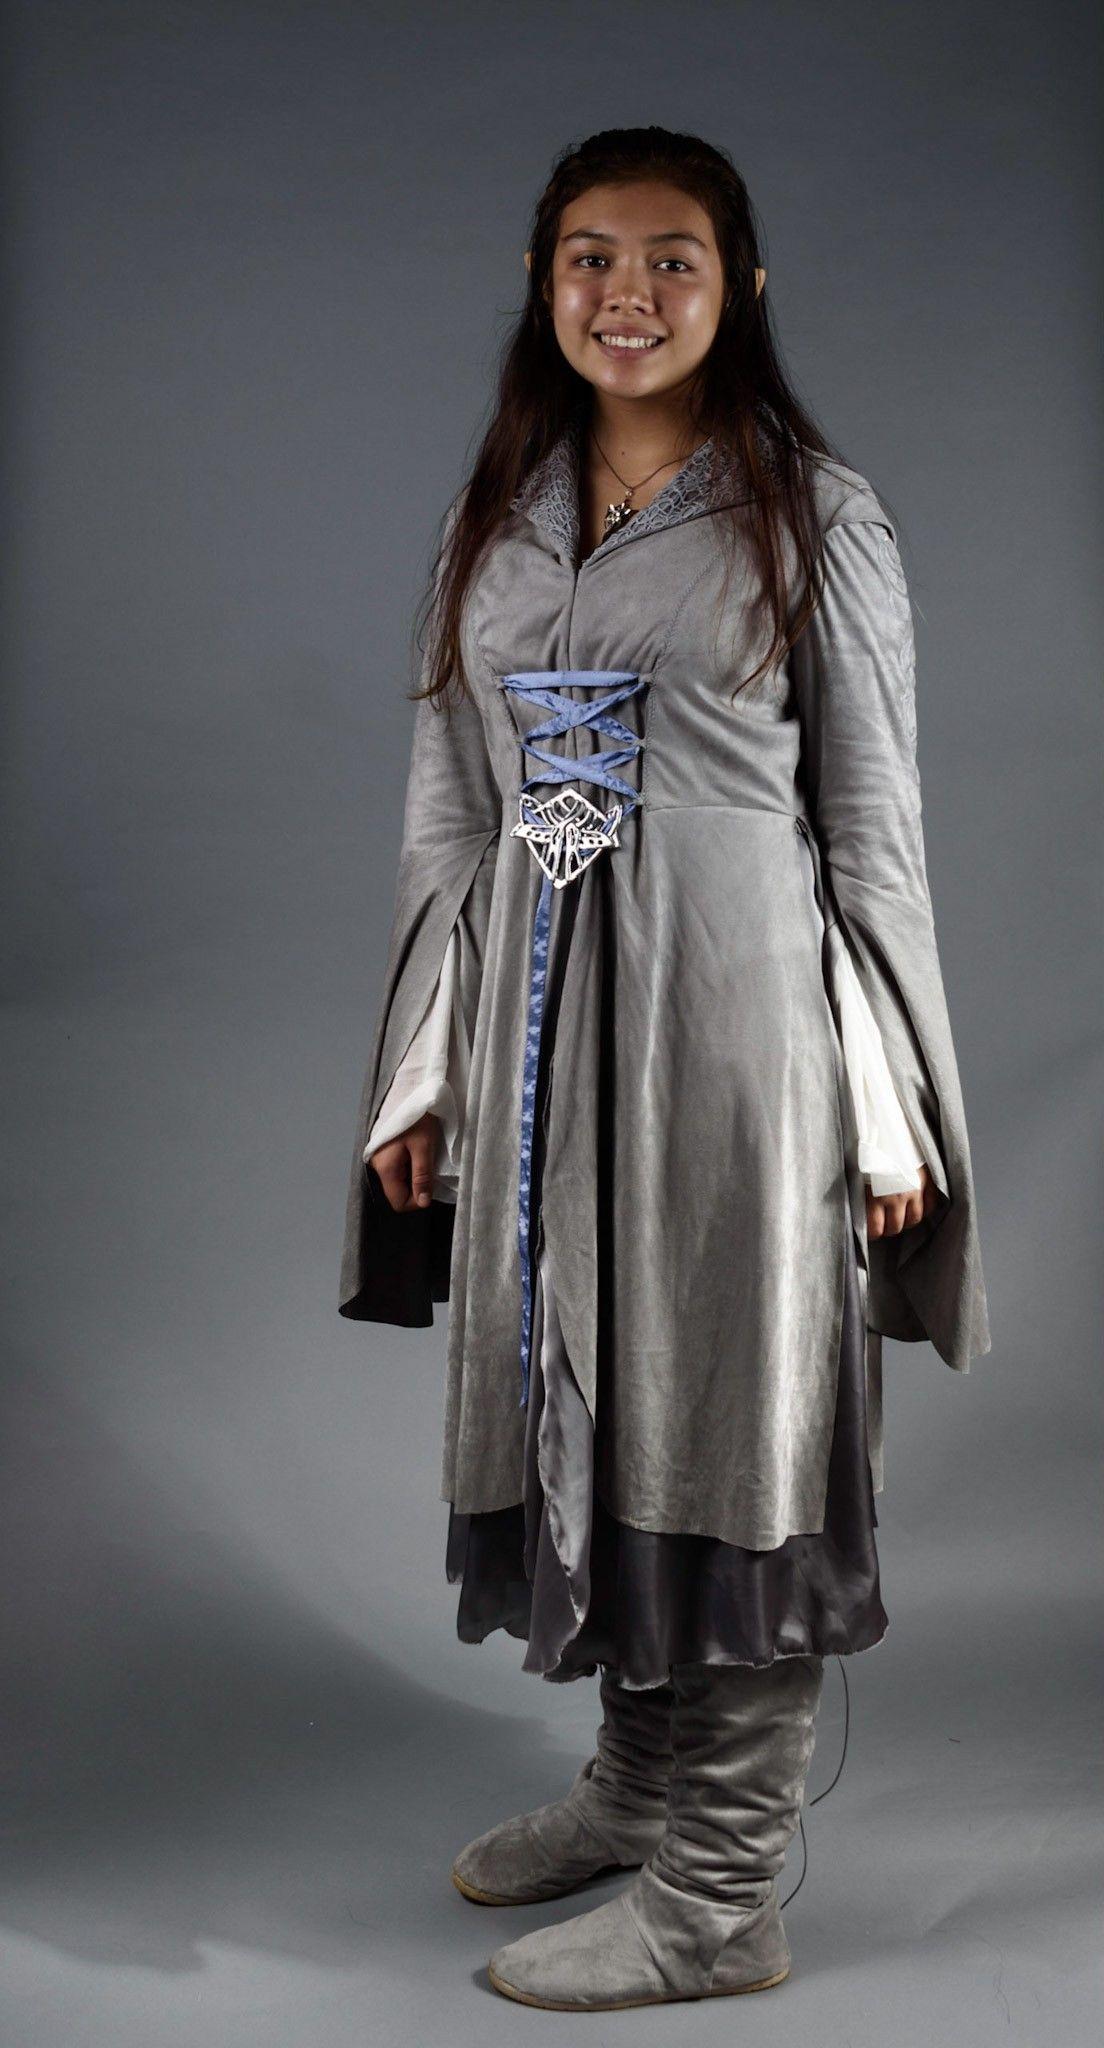 Arwen Costume Riding Coat, Arwen, Hobbit, LOTR, Lord of